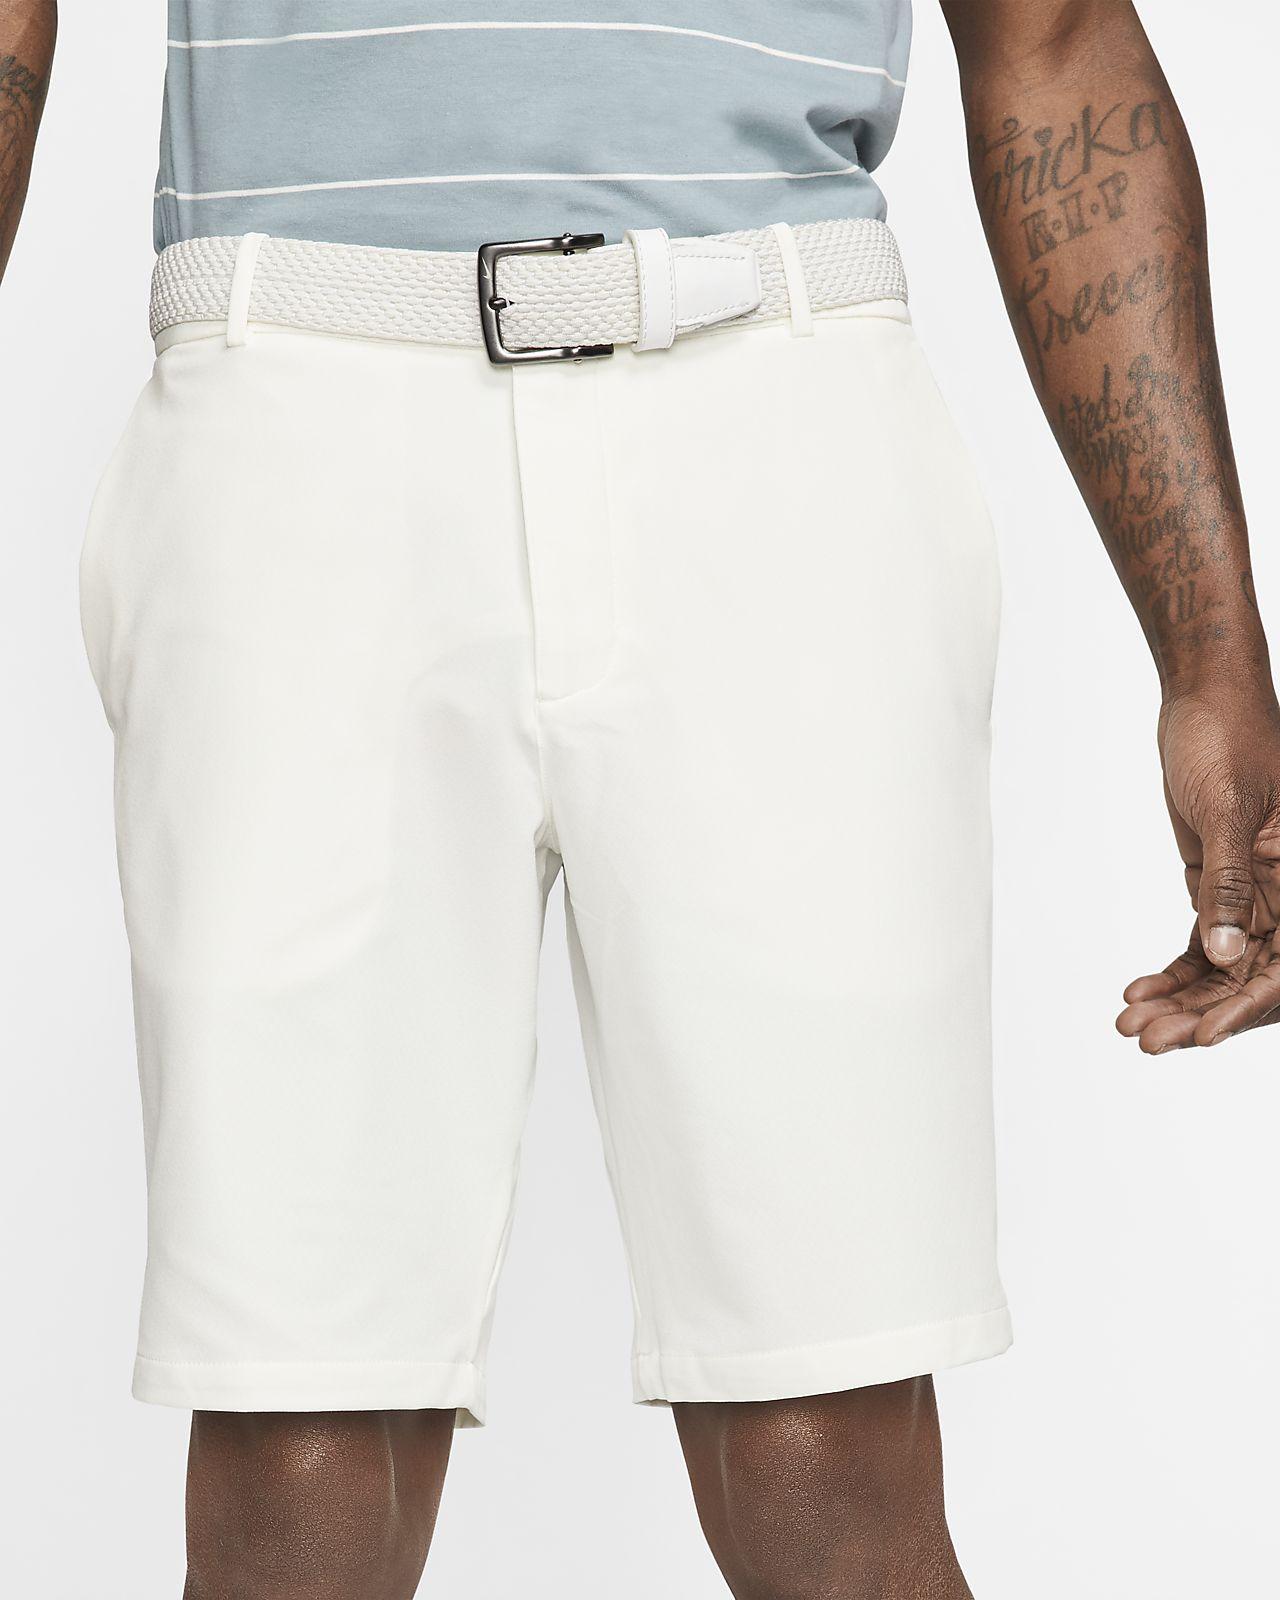 Nike Flex Men's Slim-Fit Golf Shorts